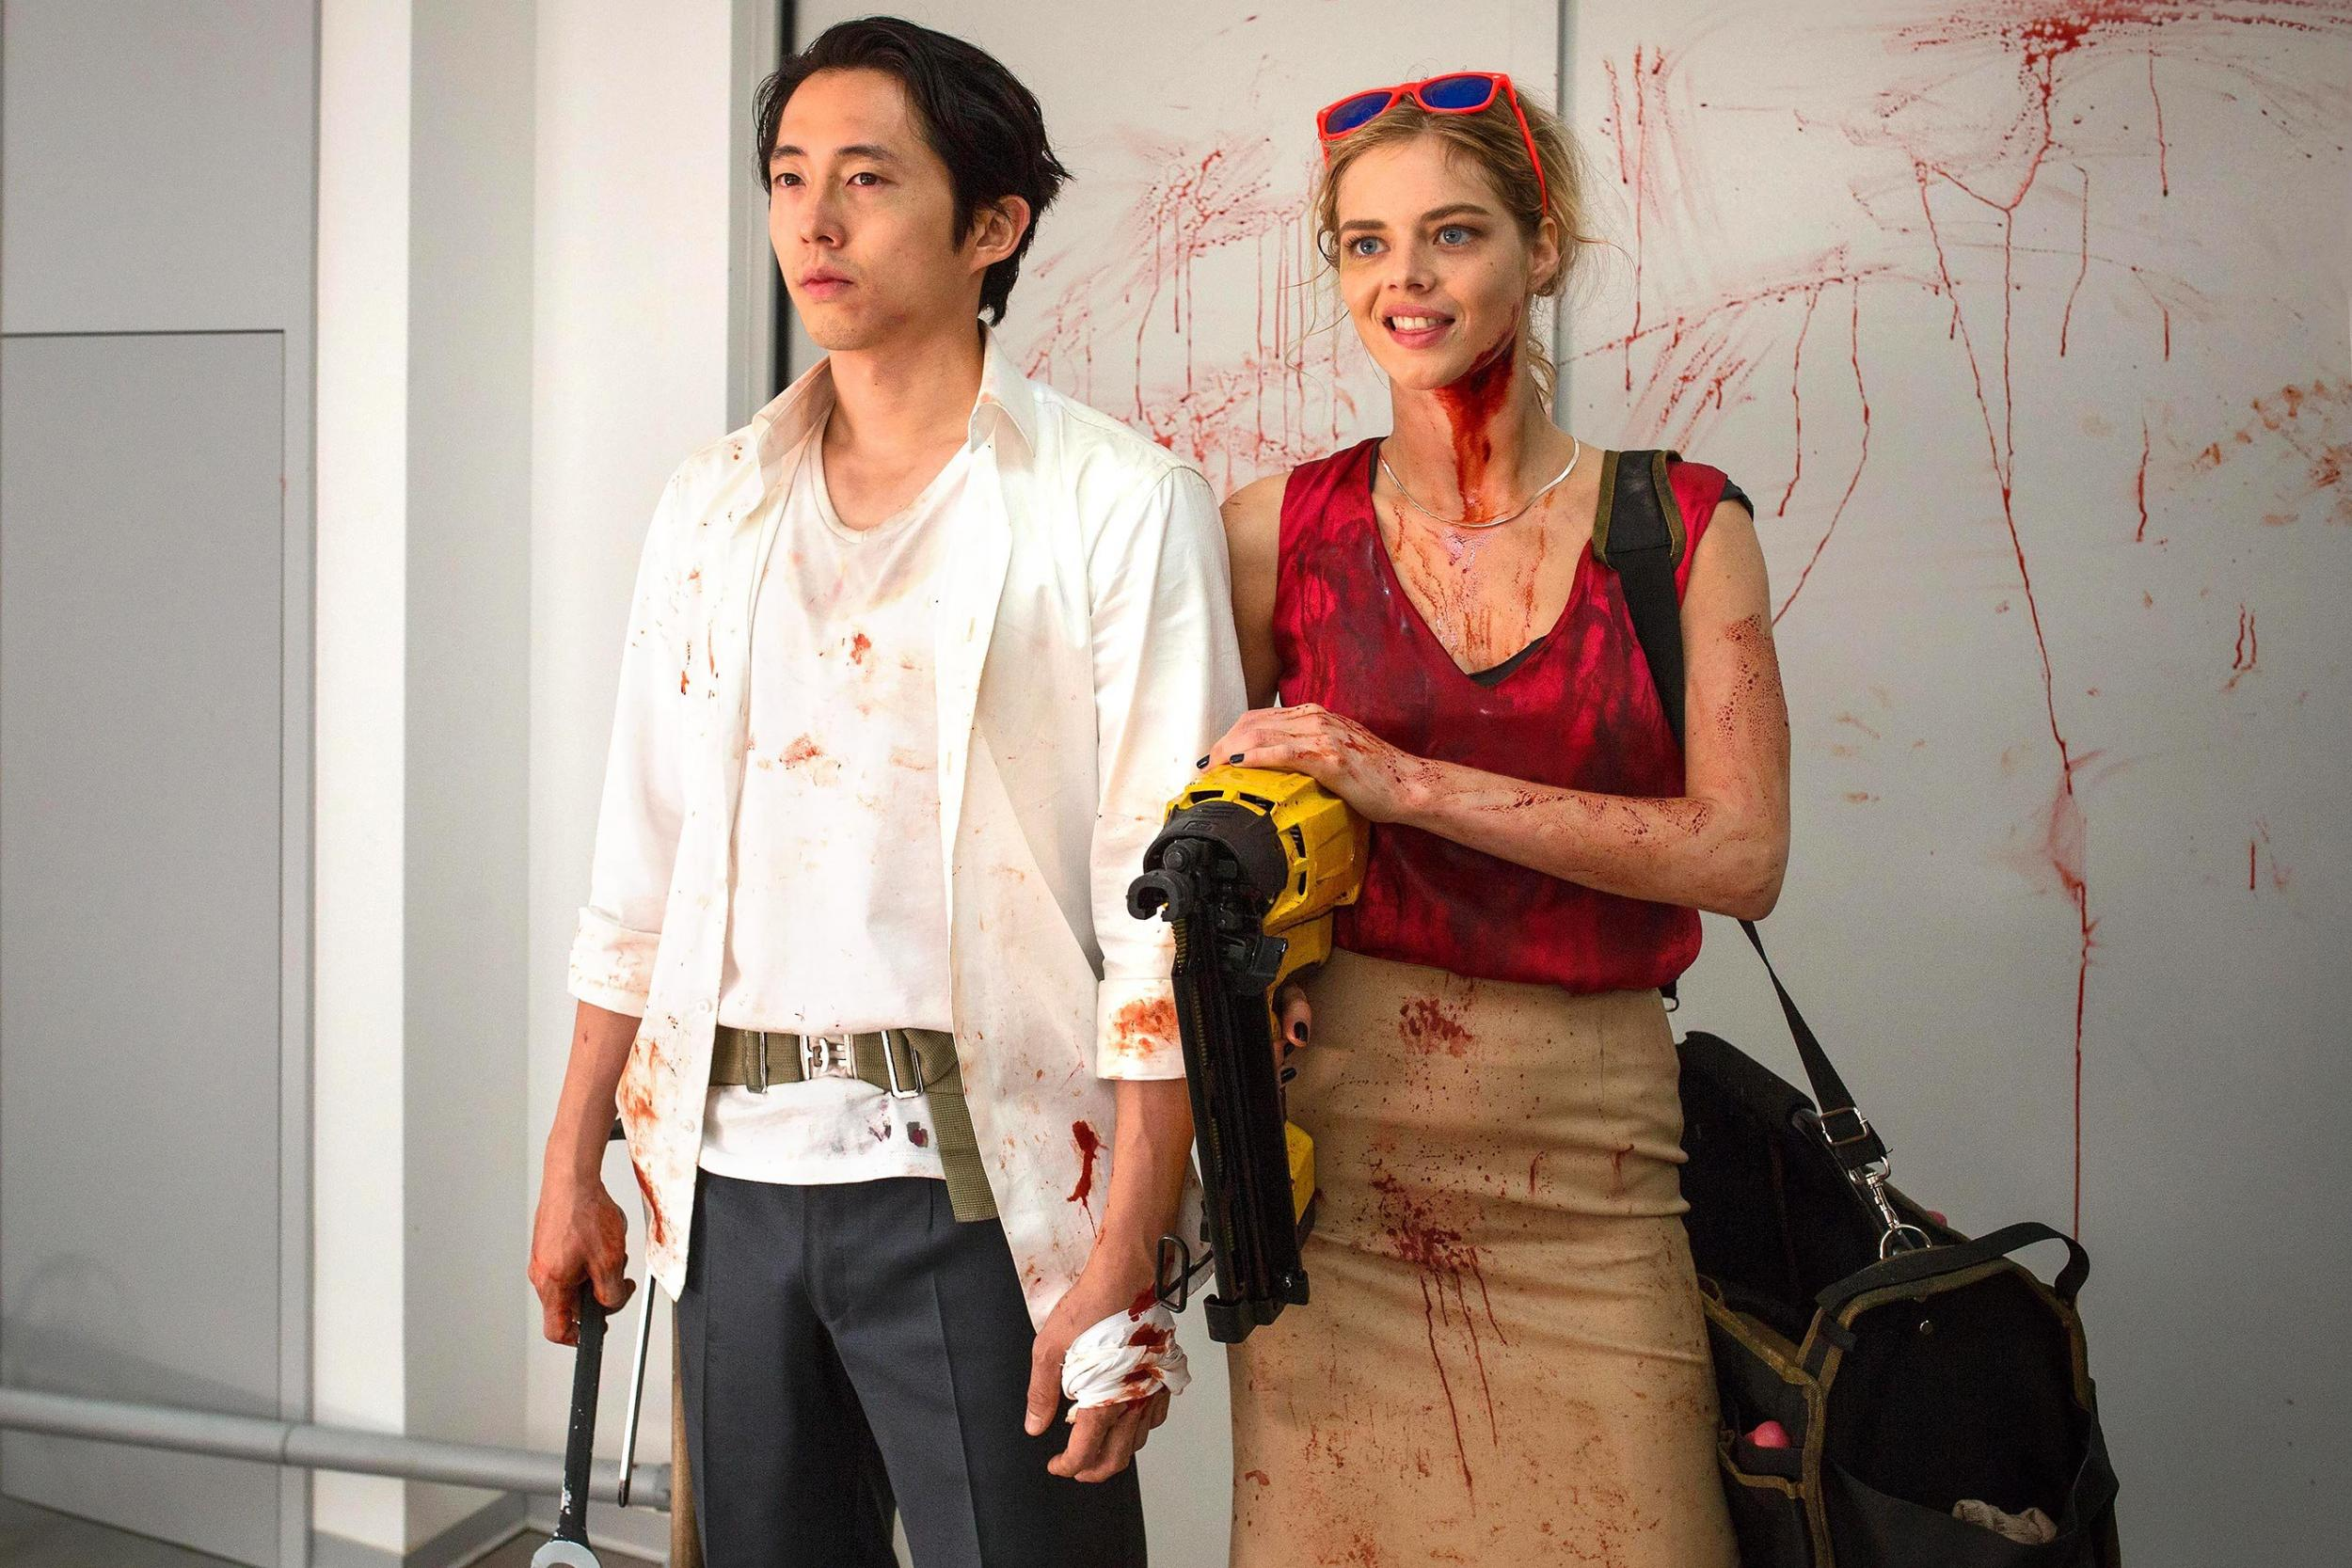 The Walking Dead star Steven Yeun's new film Mayhem has 100% on Rotten Tomatoes